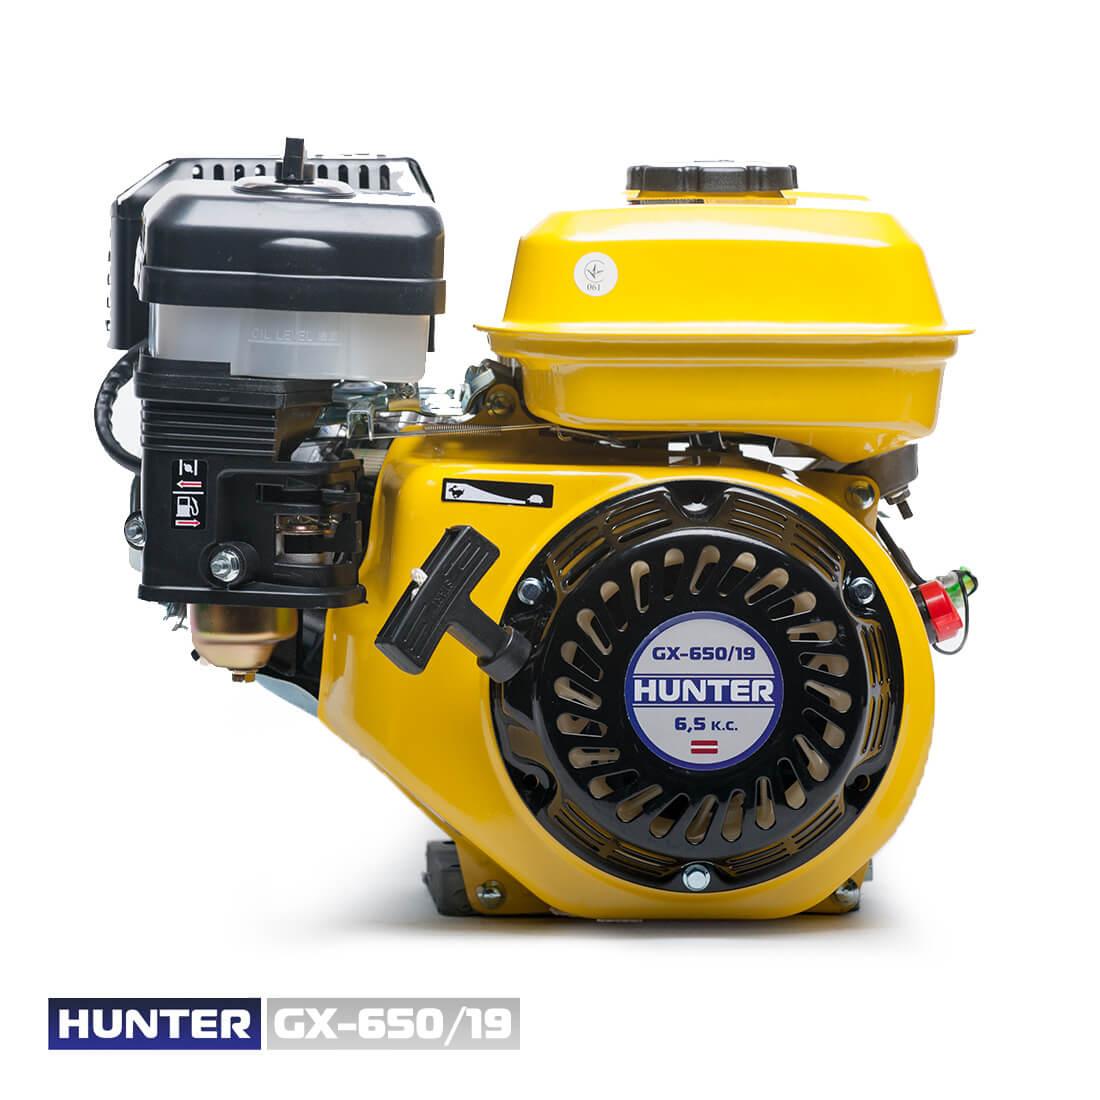 Фото GX-650/19 (шпонка) цена 2950грн №2 — Hunter